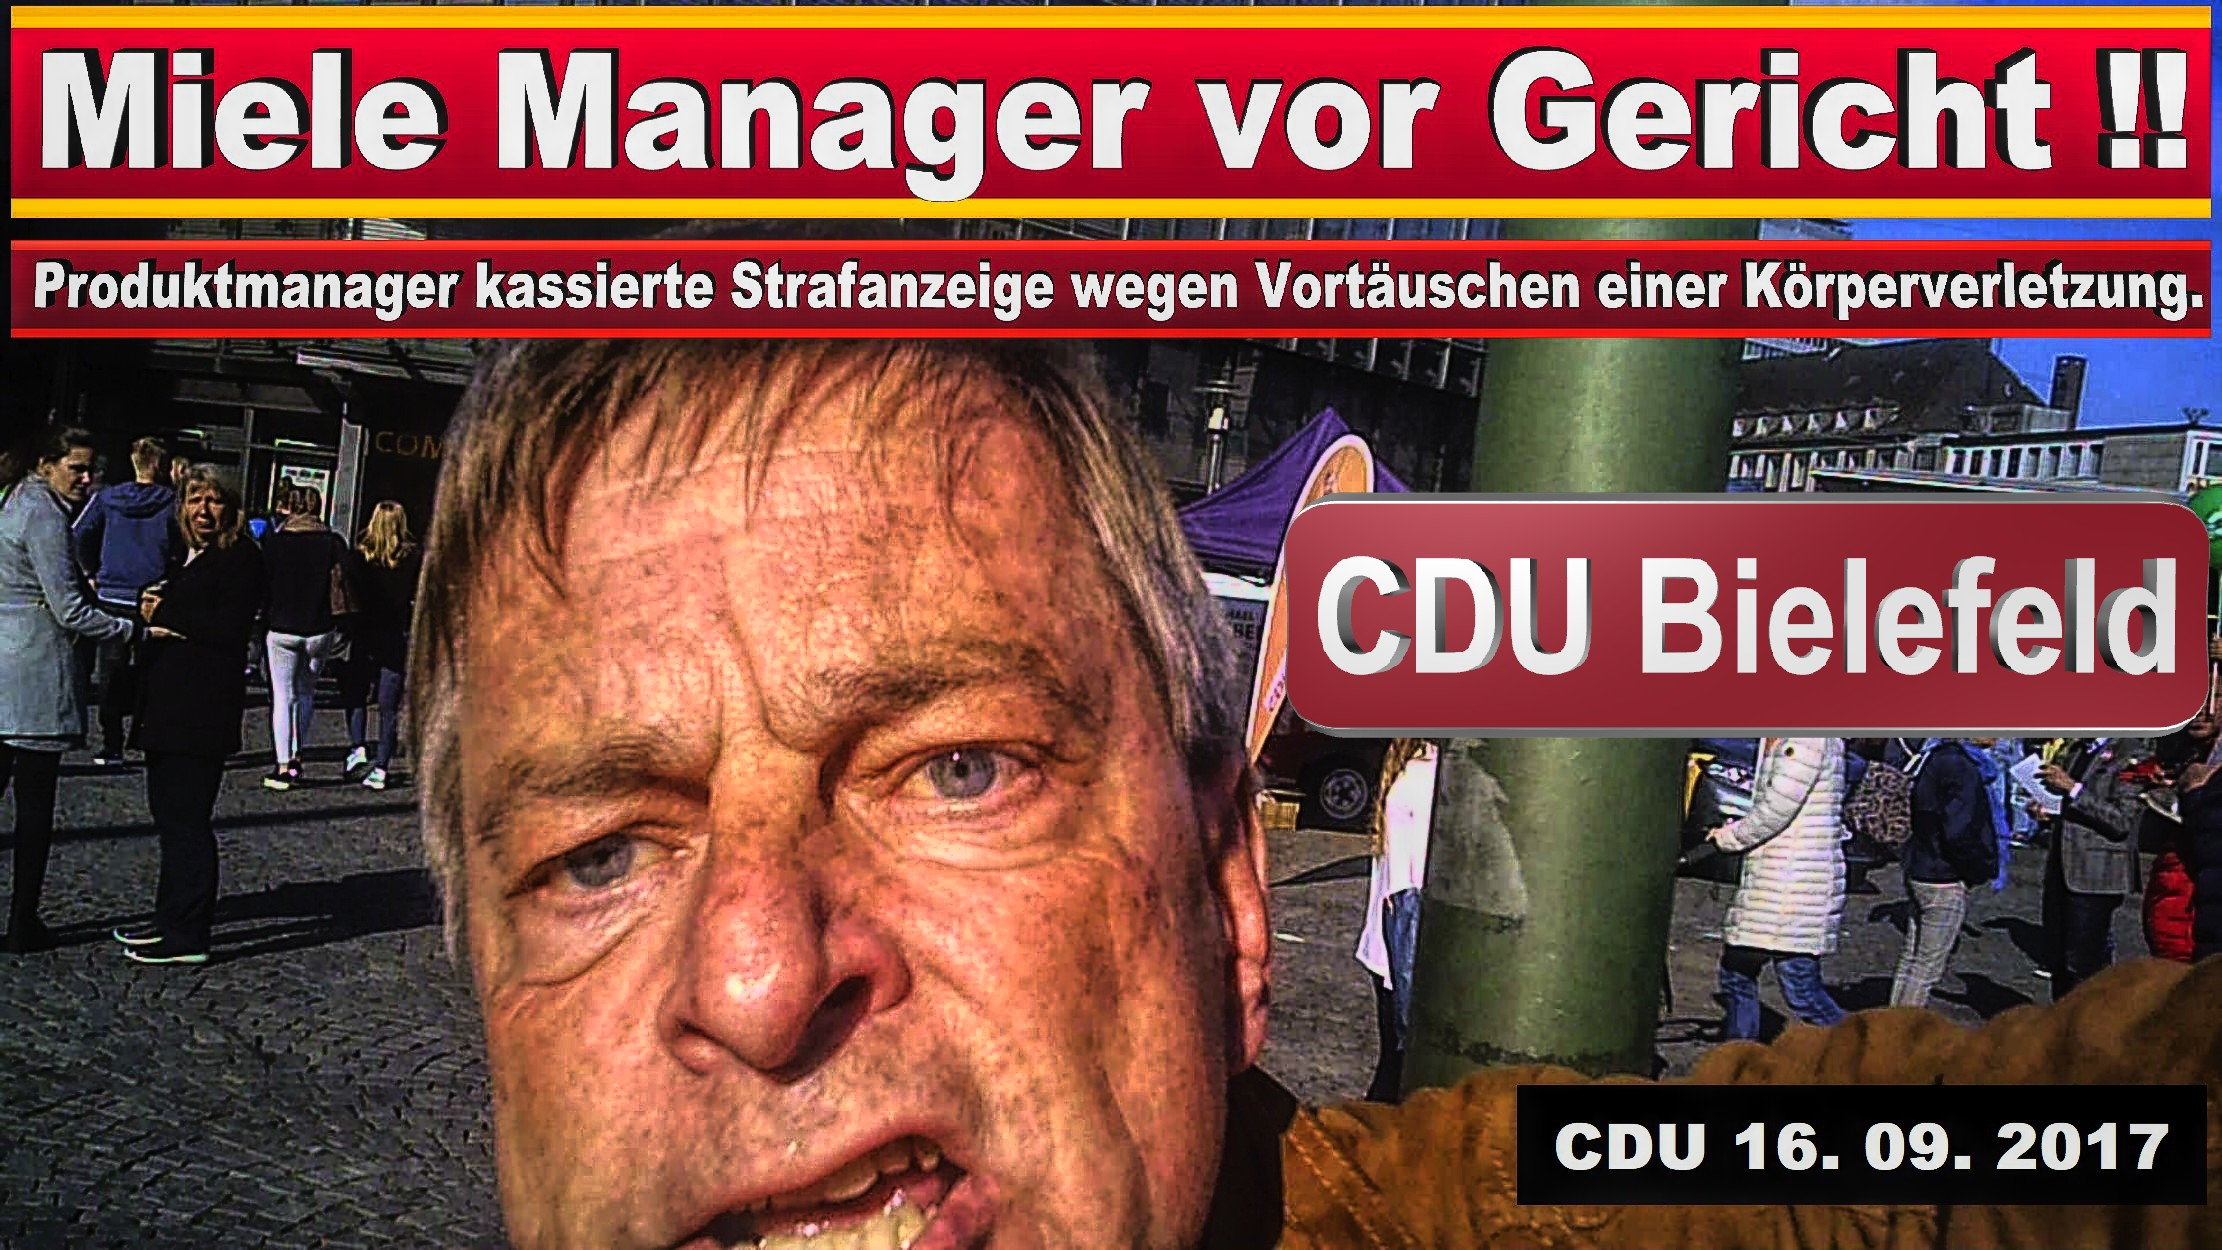 CDU BIELEFELD FACEBOOK MICHAEL WEBER MIELE GüTERSLOH PRODUKTMANAGER JURIST SPD FDP AFD BIELEFELD